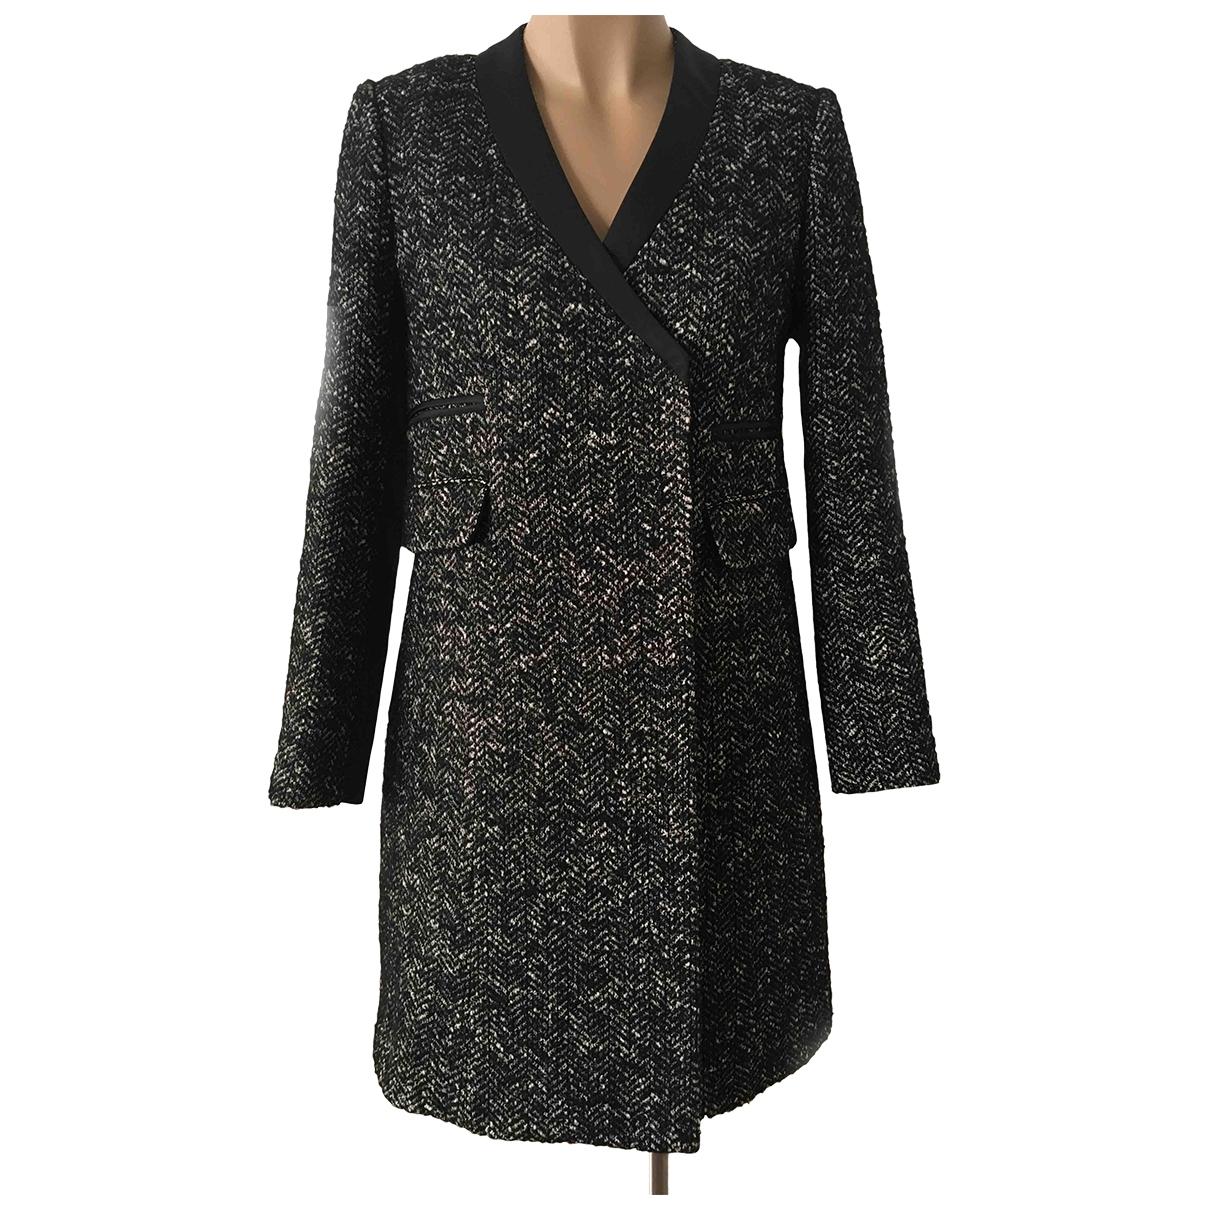 Tara Jarmon \N Black Wool coat for Women 38 FR